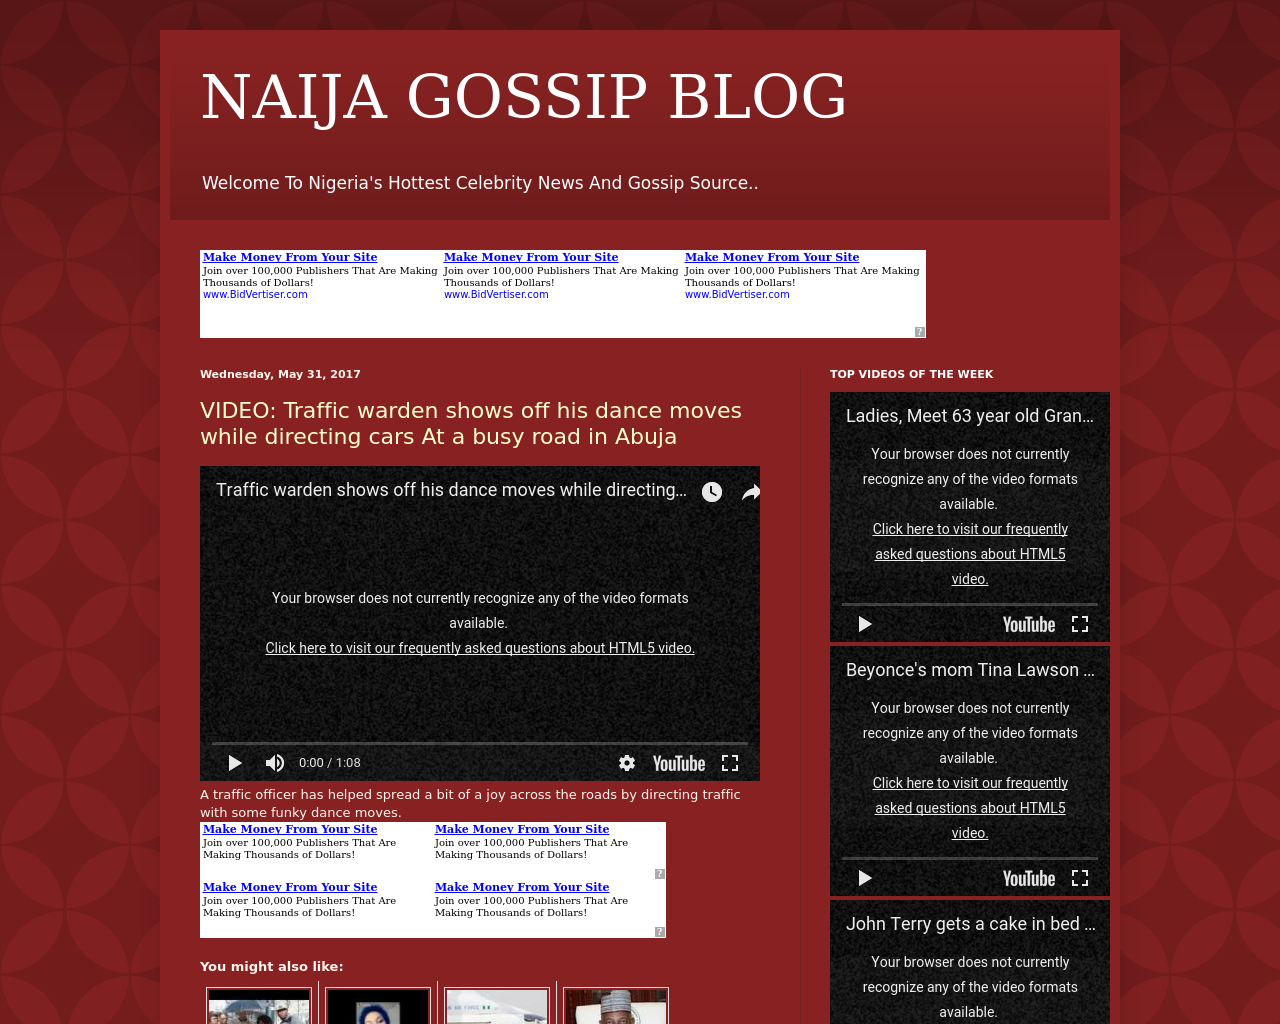 NAIJA-GOSSIP-BLOG-Advertising-Reviews-Pricing